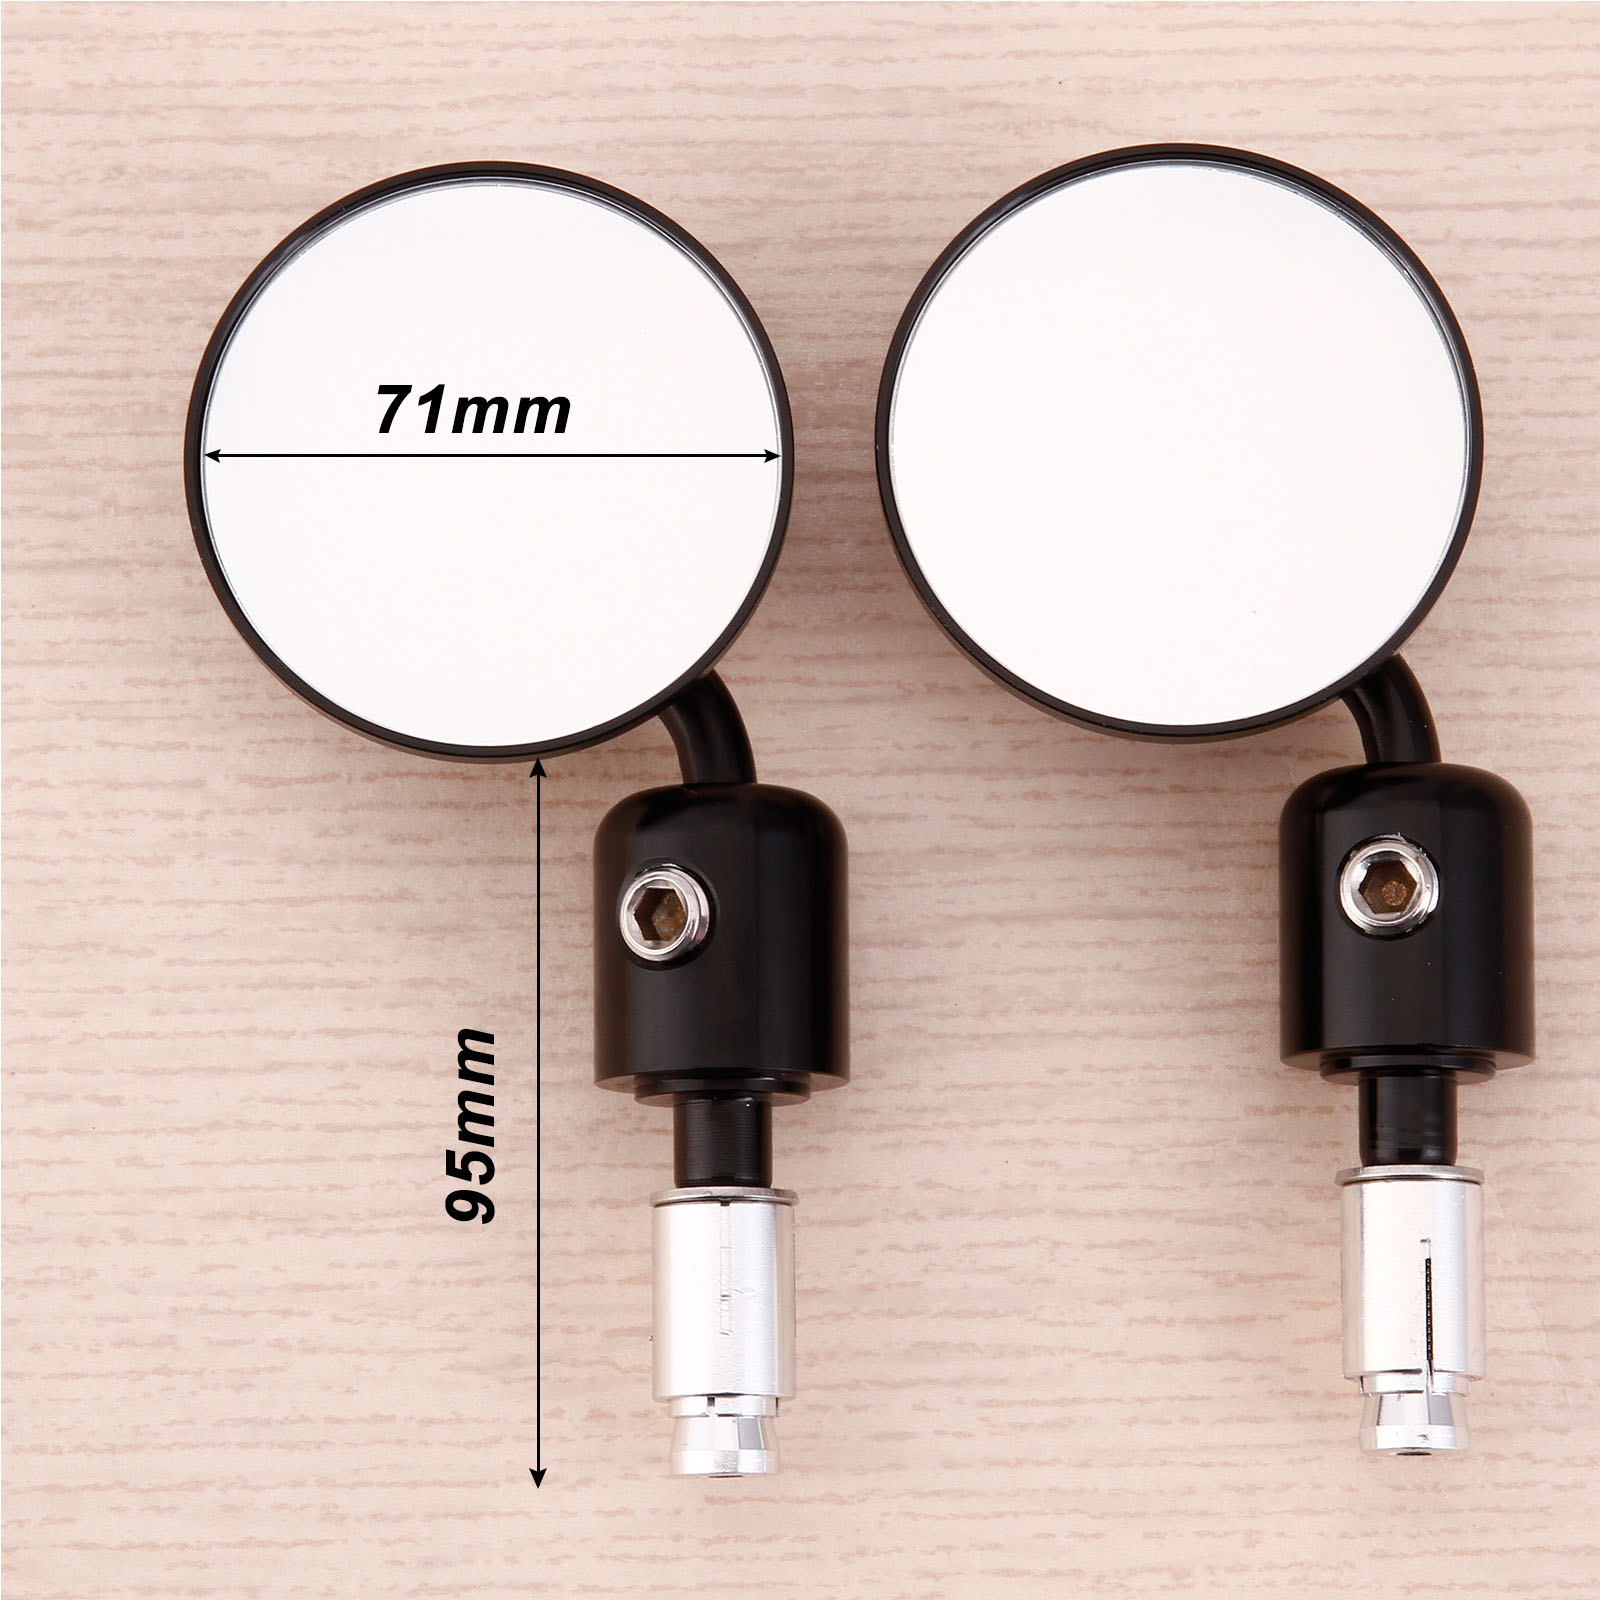 2x motorrad r ckspiegel lenkerendenspiegel spiegel 7 8. Black Bedroom Furniture Sets. Home Design Ideas